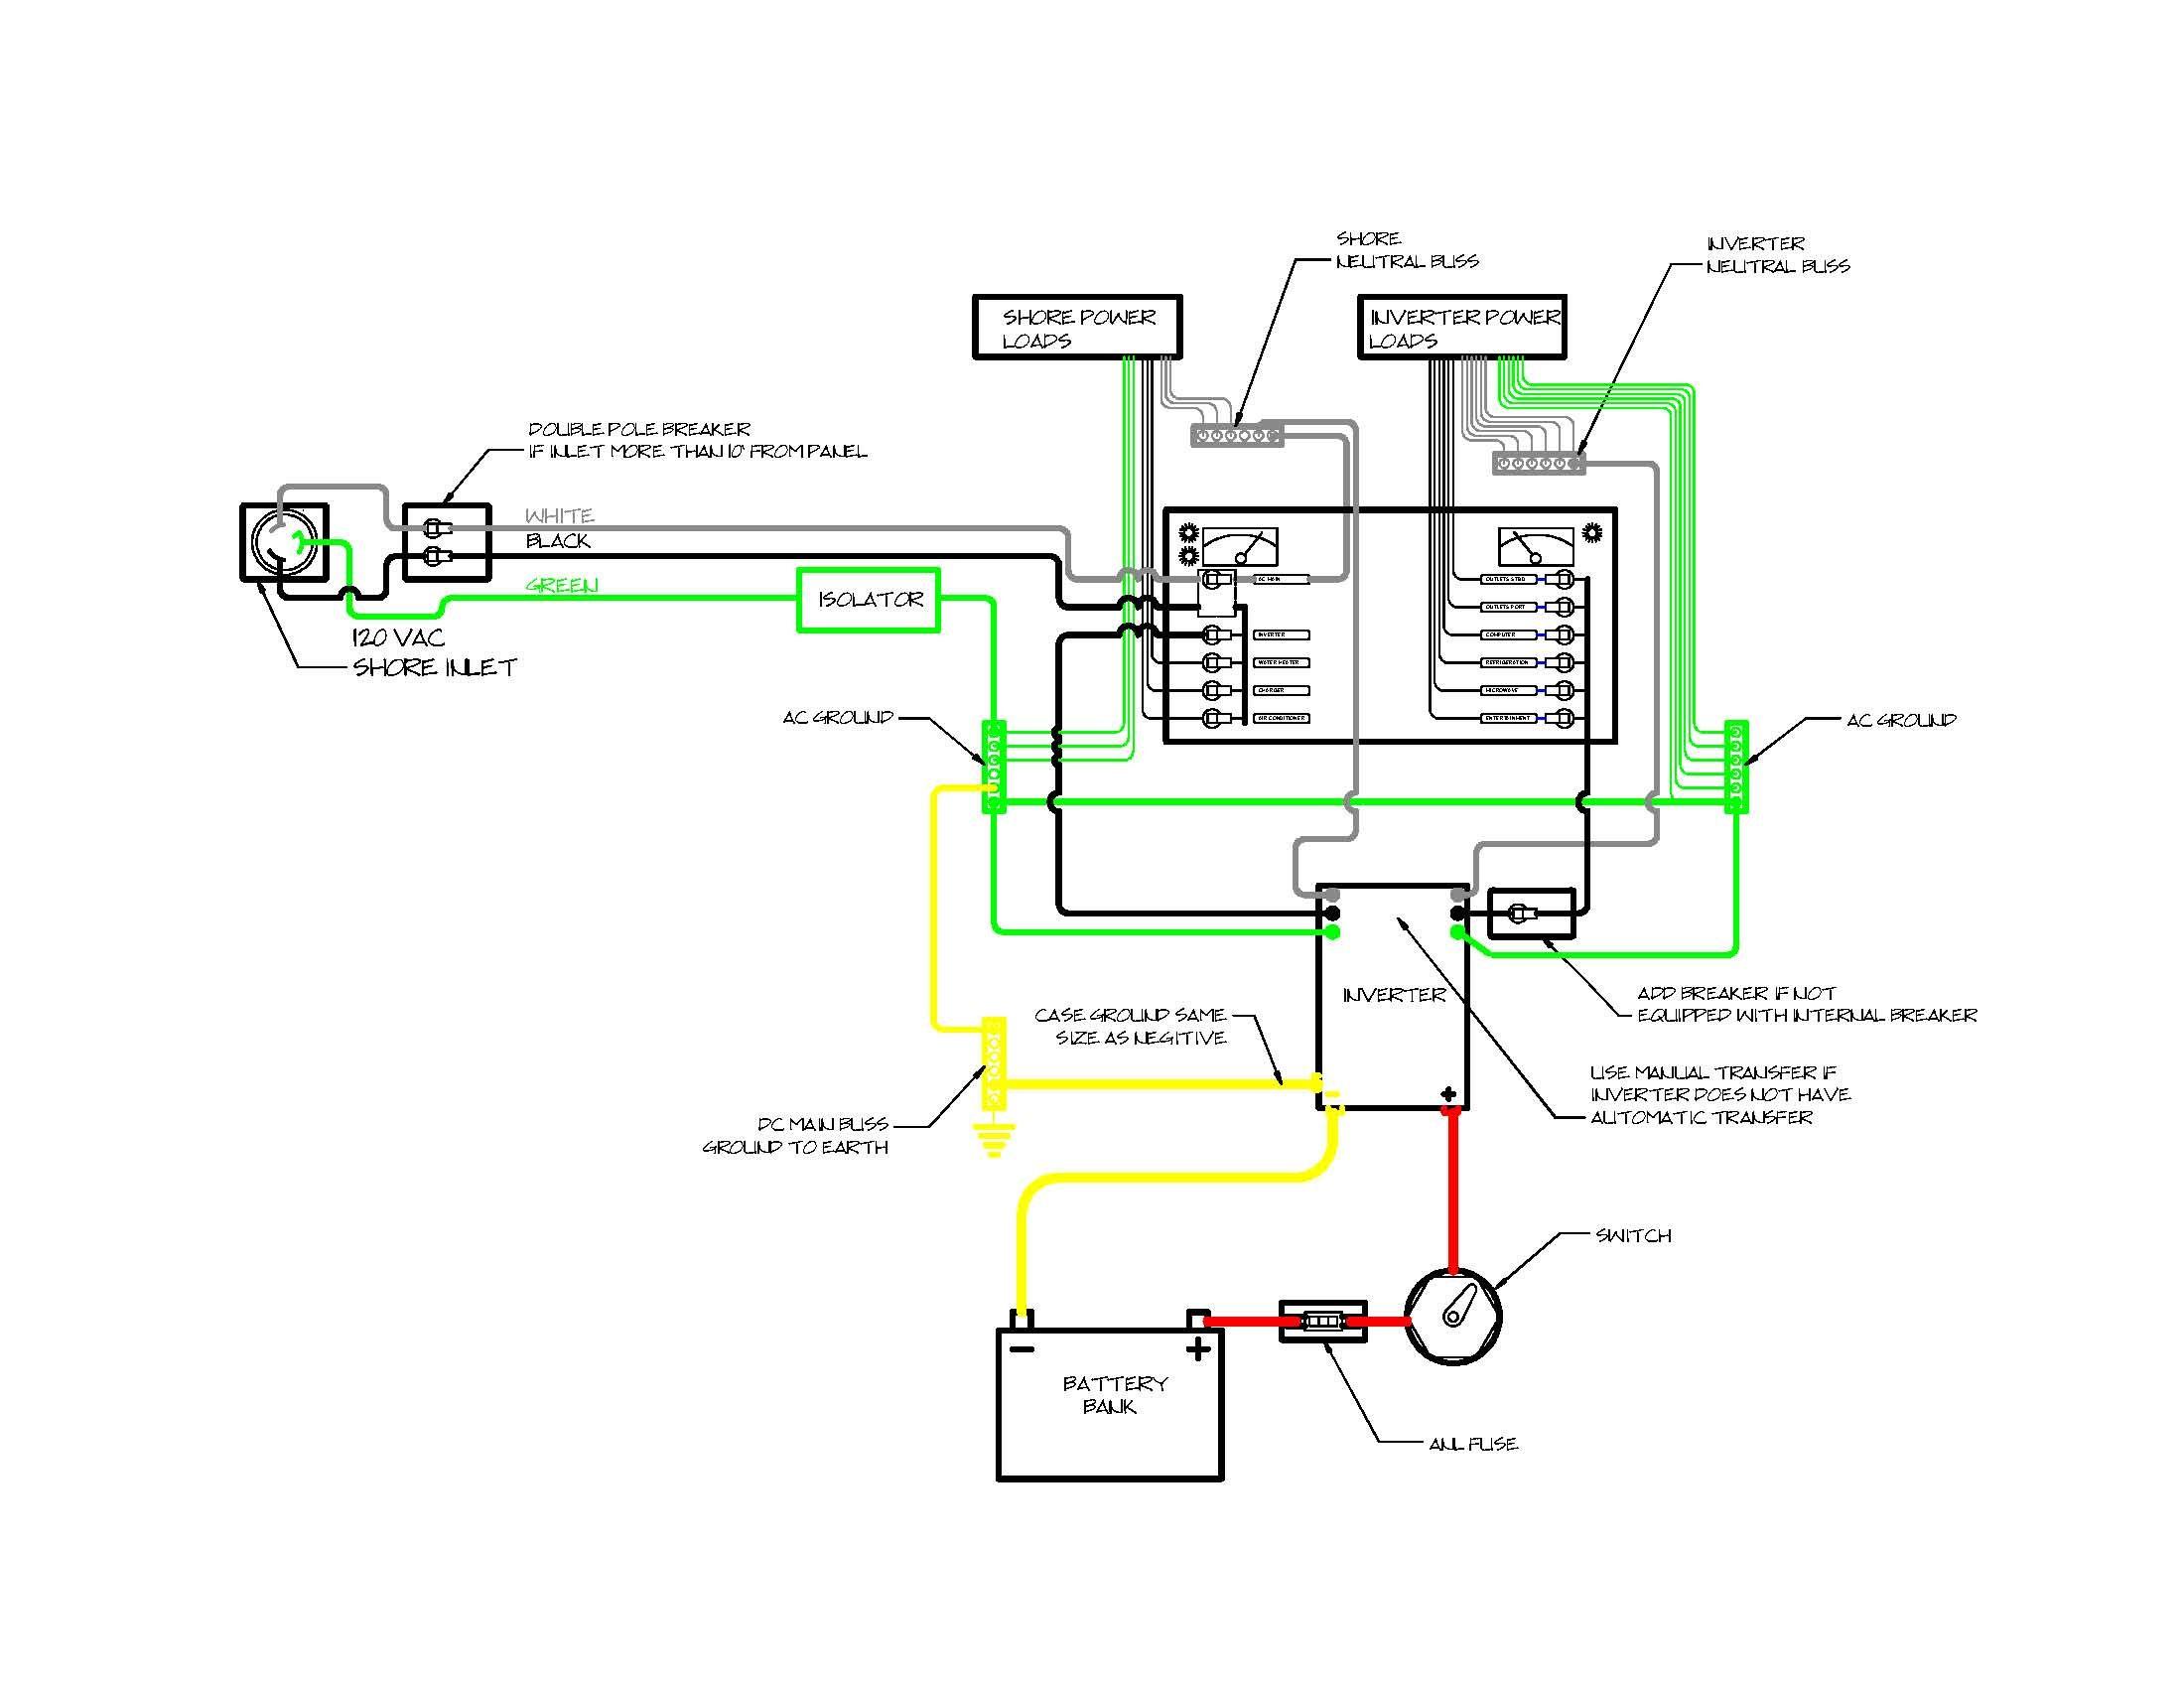 Marine Power Inverter Wiring Diagram Check more at http